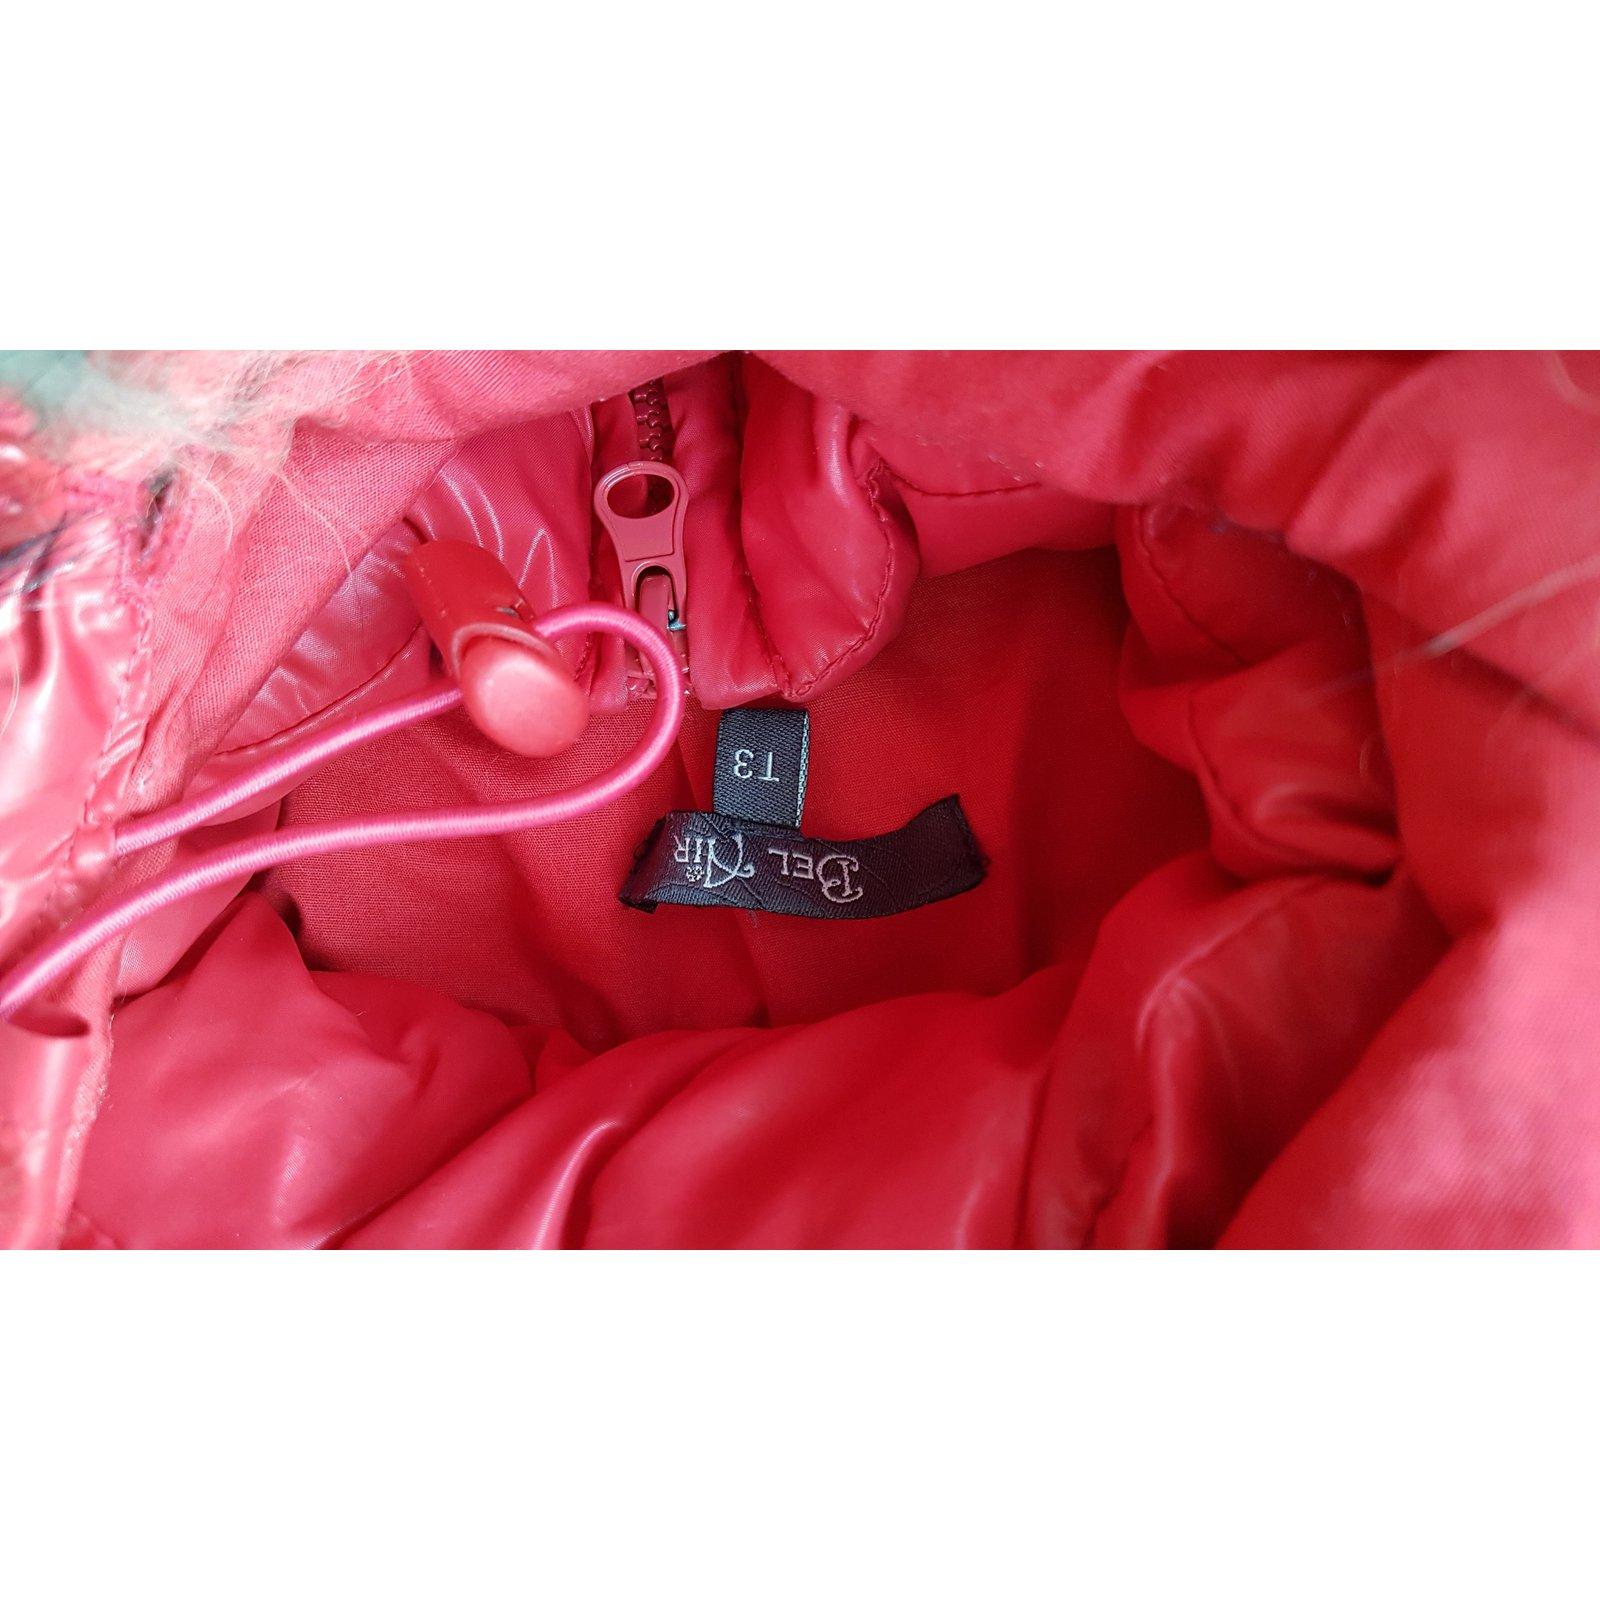 Manteaux Bel Air doudoune rouge Polyester Rouge ref.32939